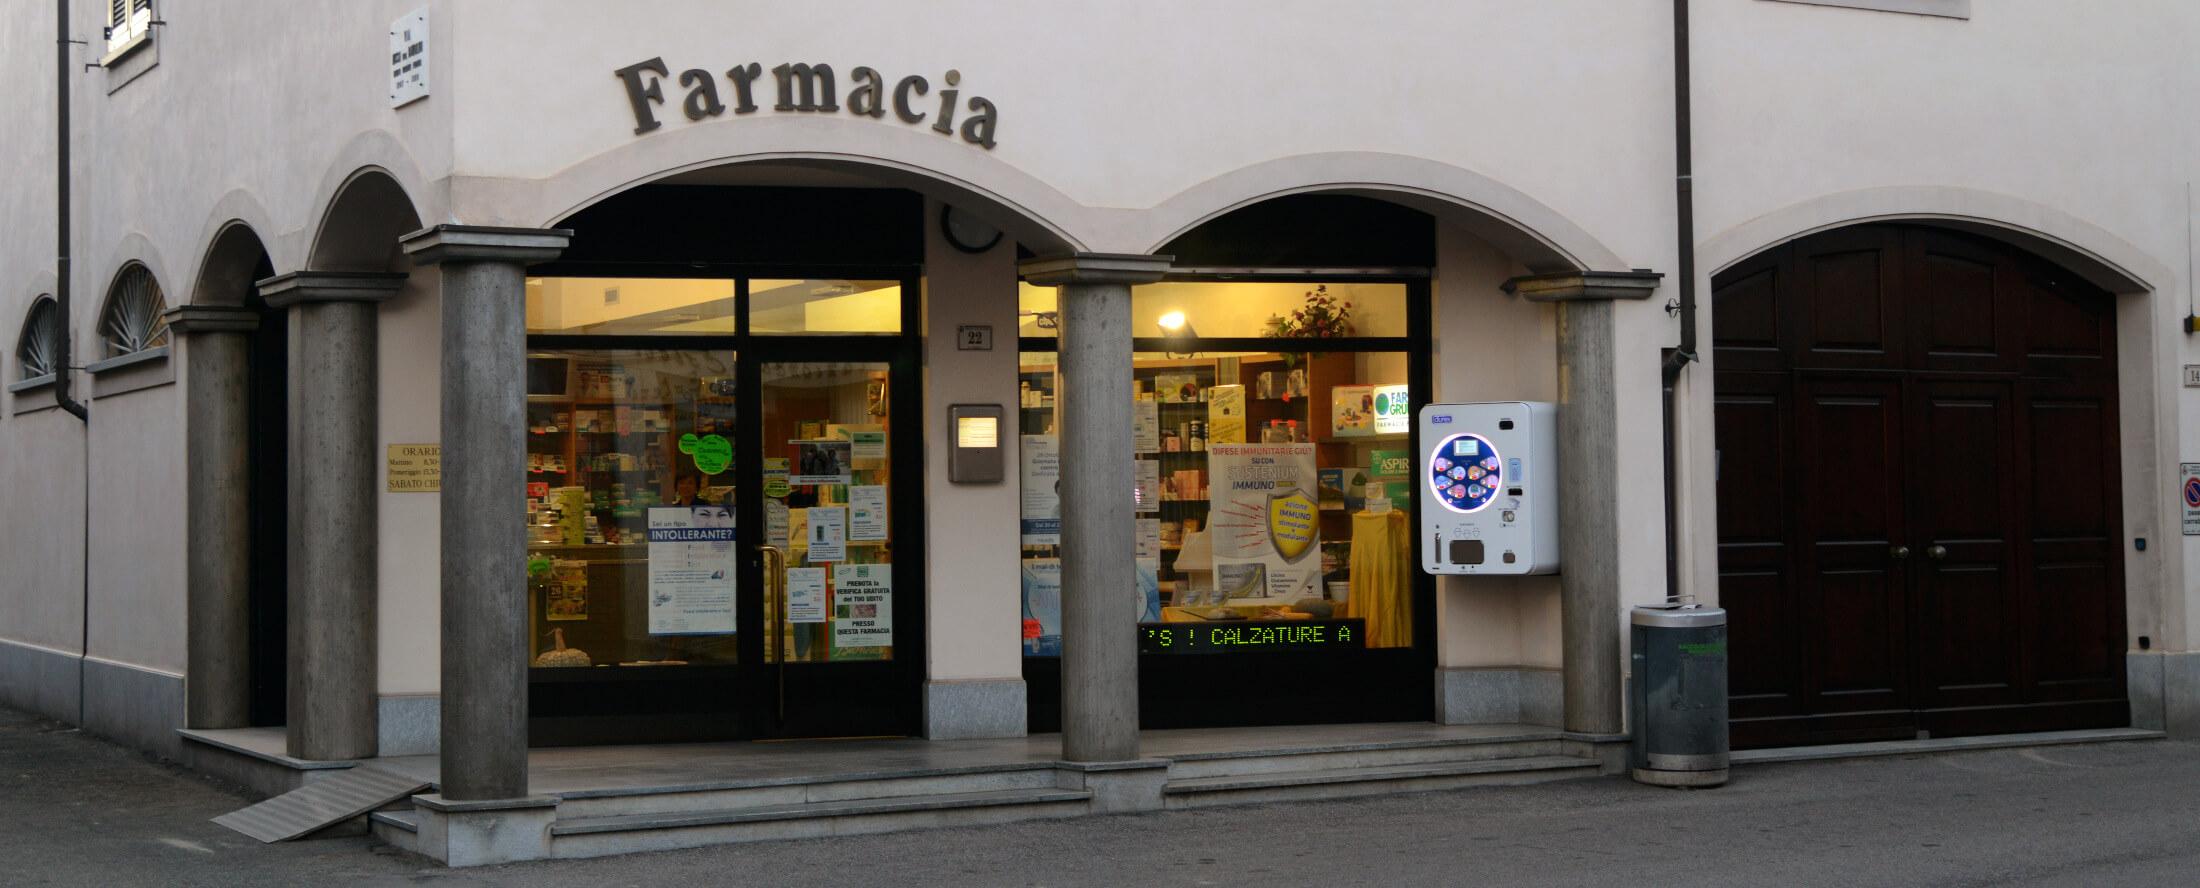 farmacia-re-gigante